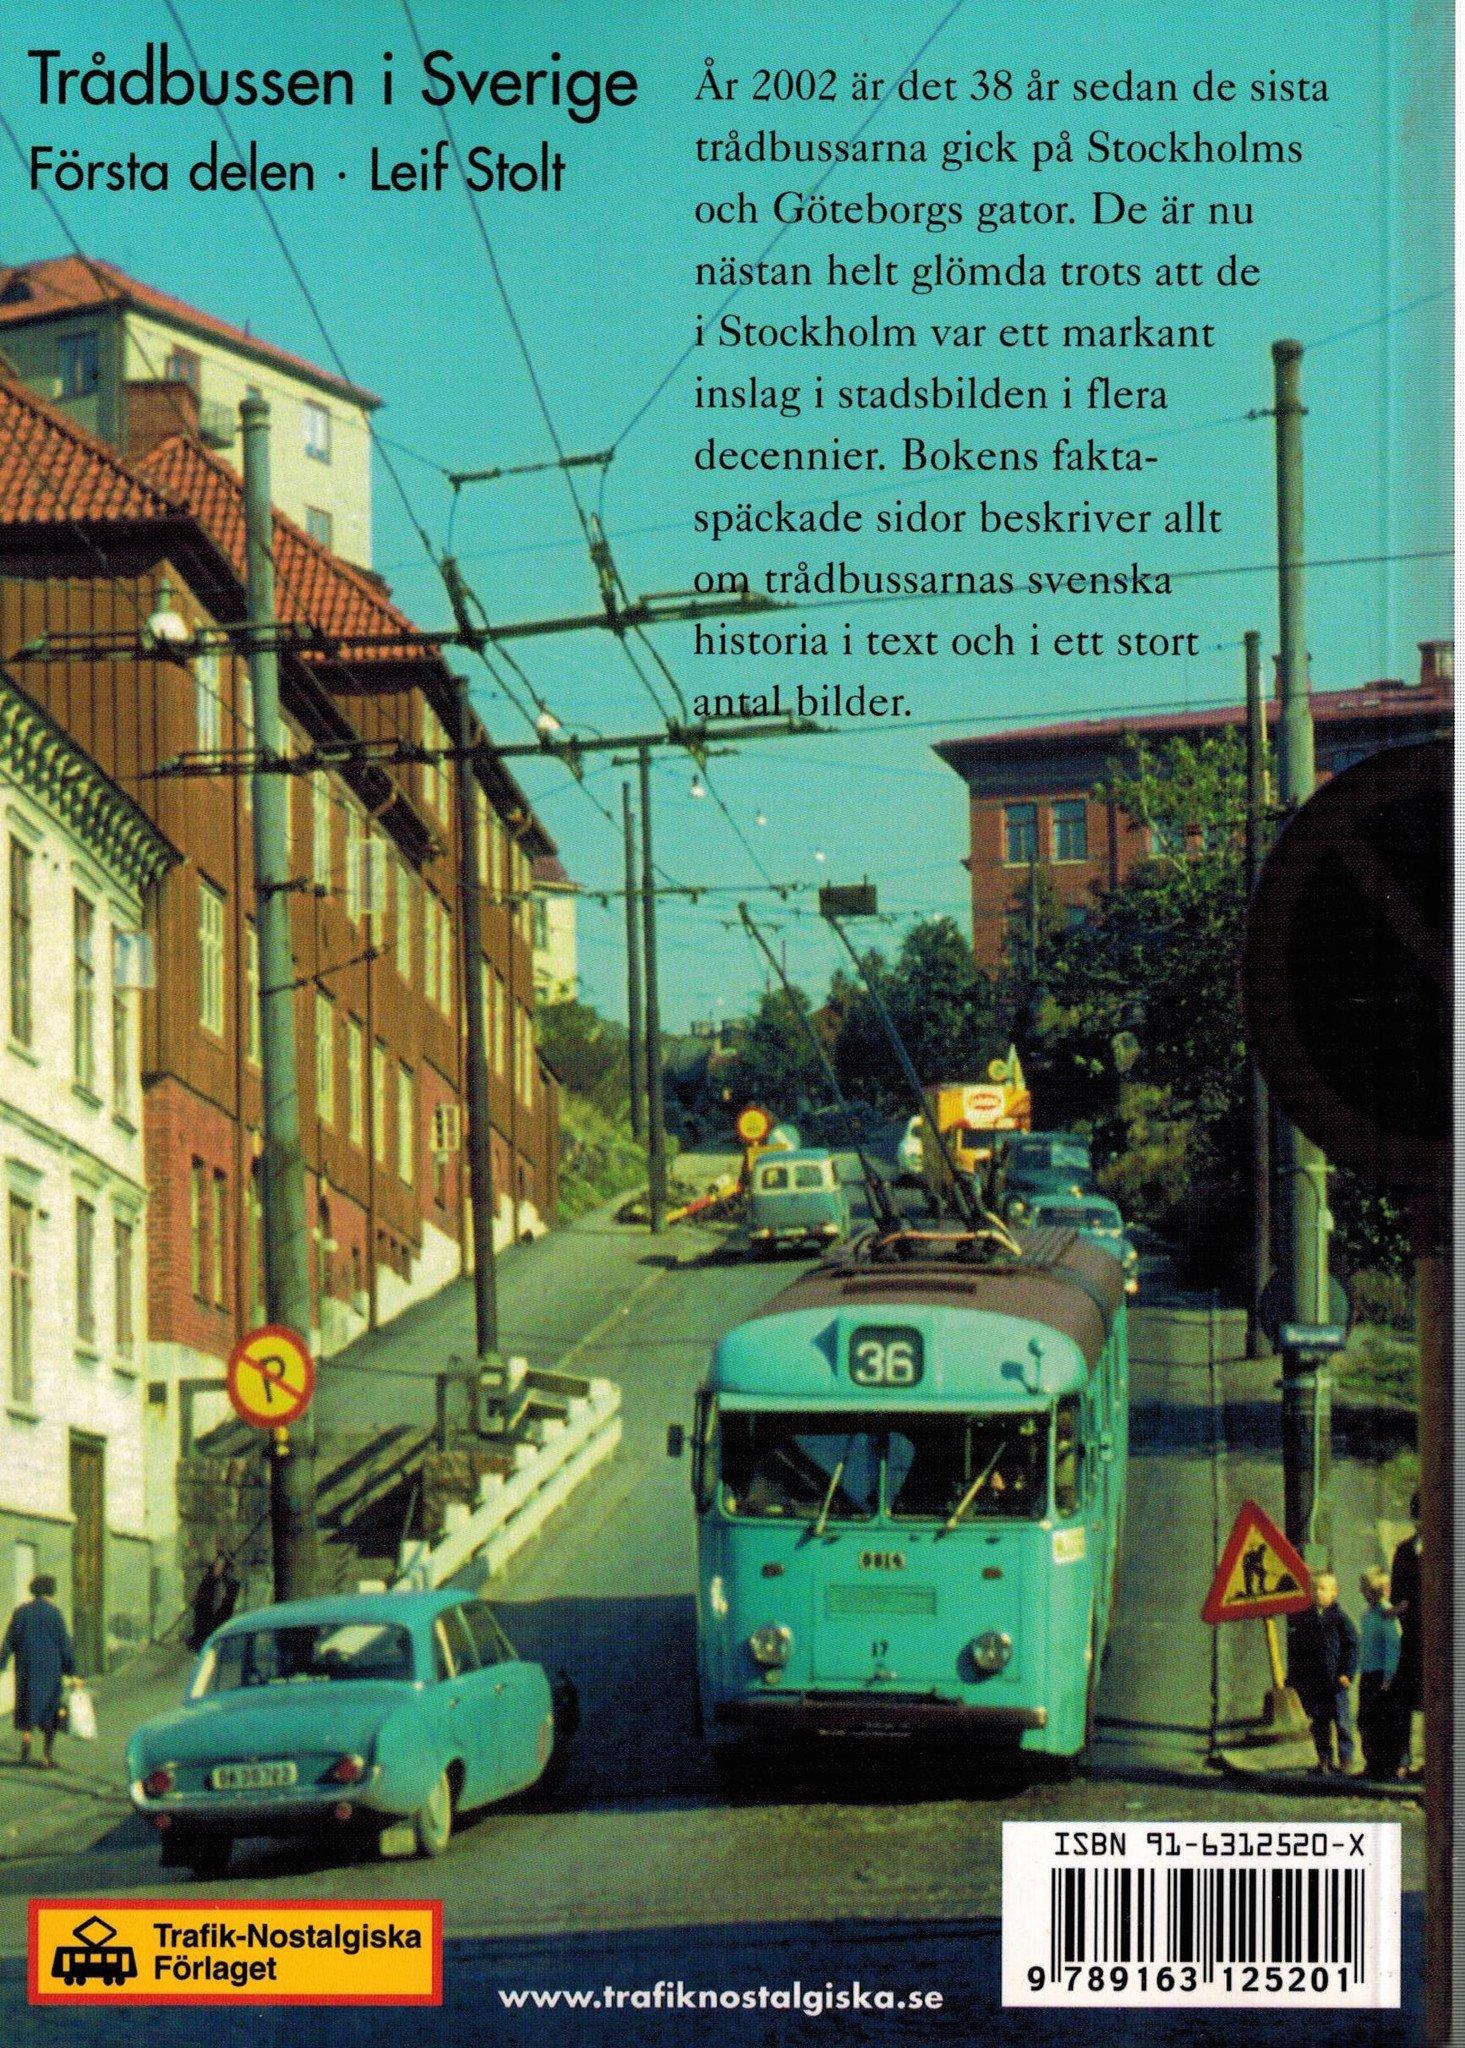 Trådbussen i Sverige